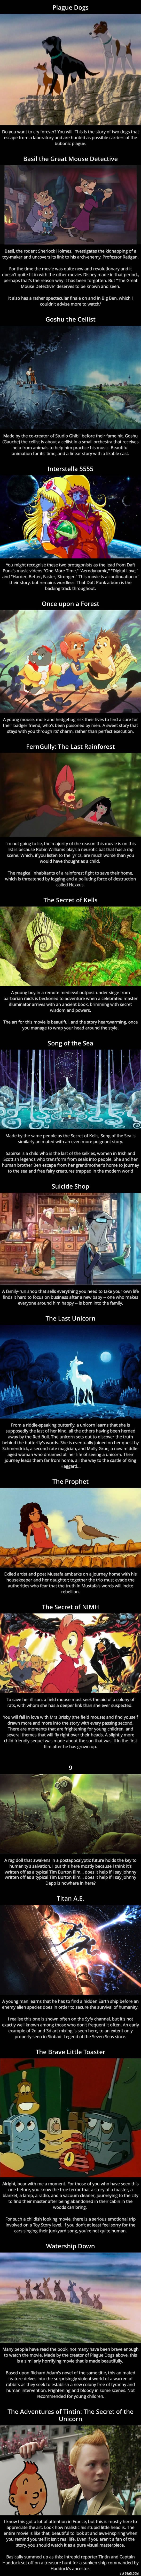 Underappreciated (or overlooked) animated movies Plus Treasure Planet, Atlantis, The Triplets De Belleville, Felidae, Mary & Max...